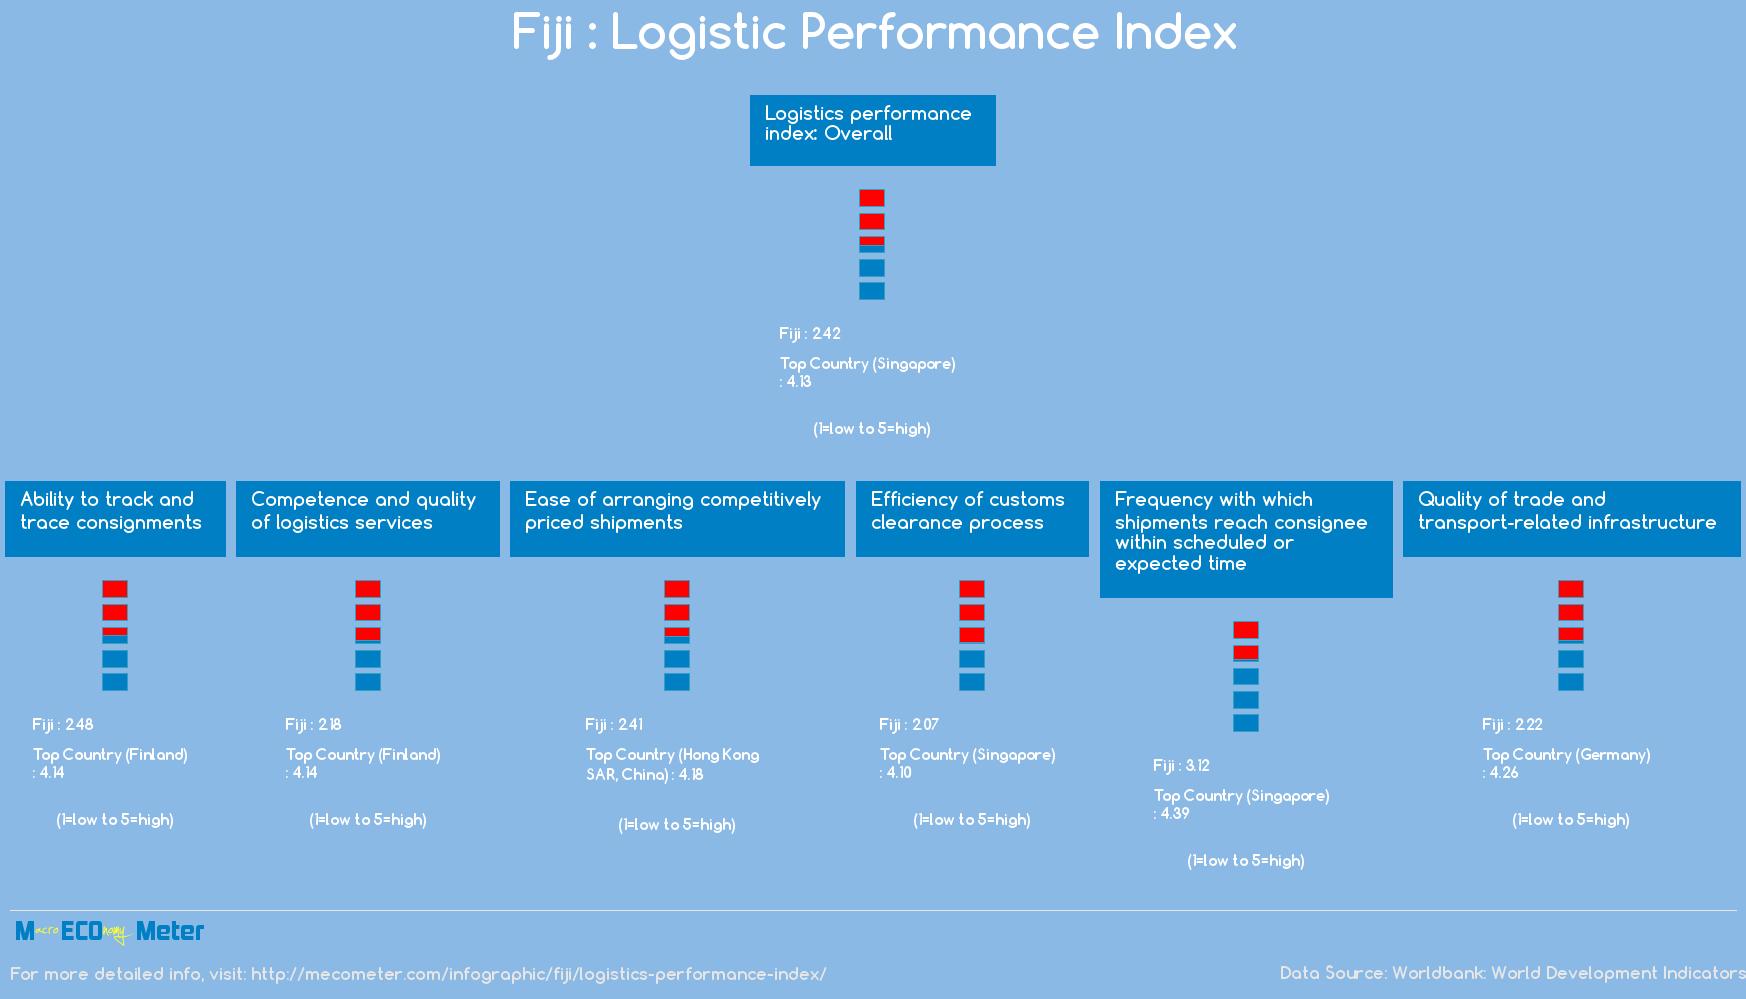 Fiji : Logistic Performance Index